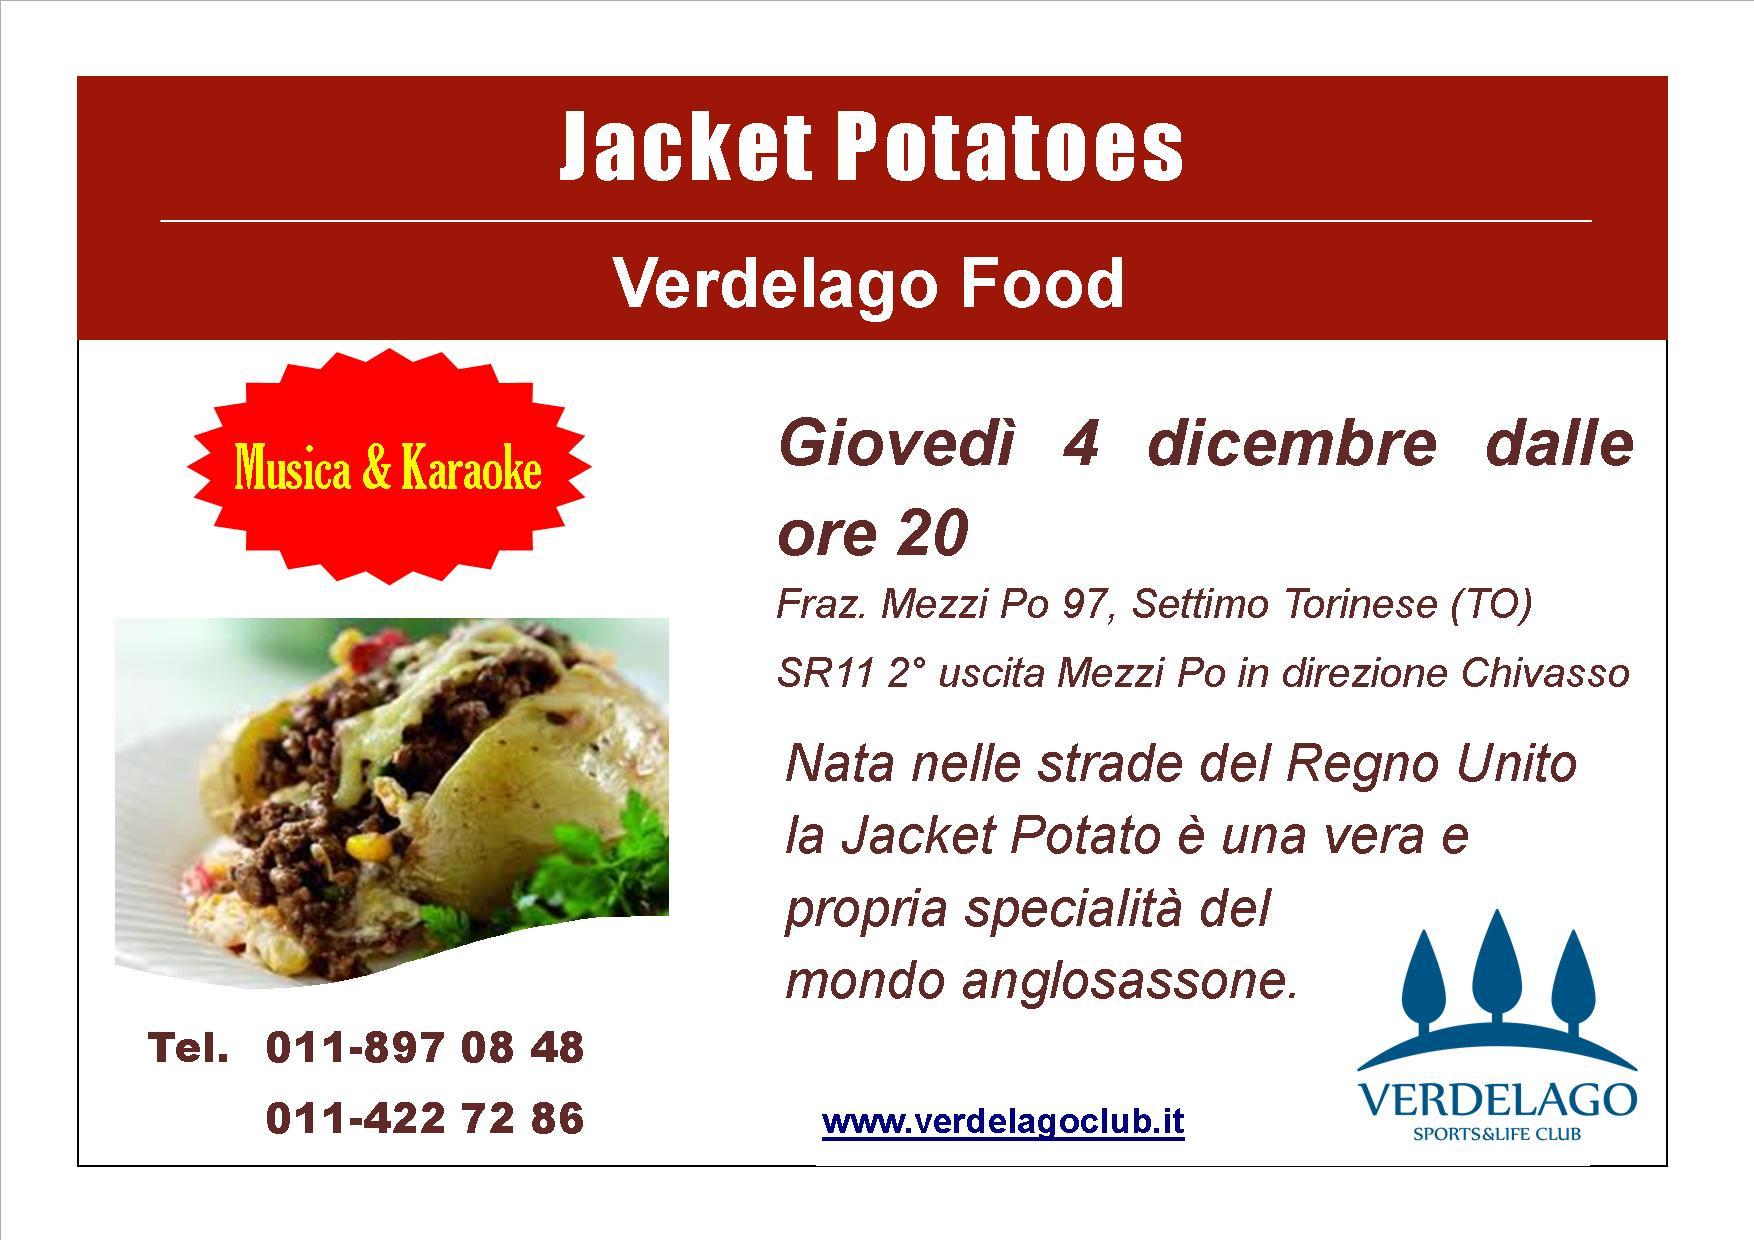 Jacket Potatoe 4 dicembre 2014